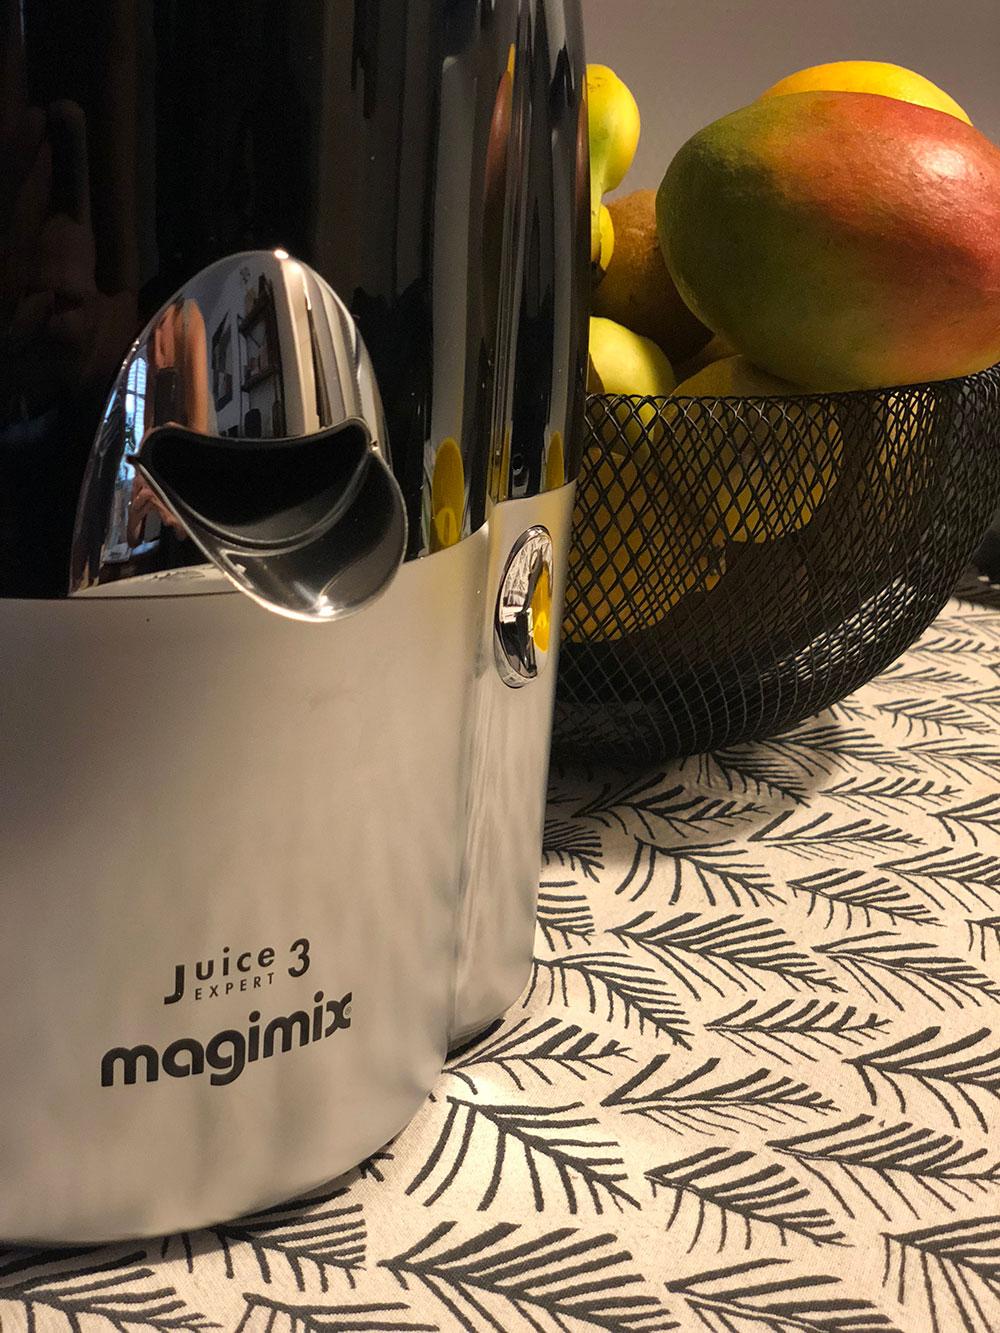 magimix juice expert moteur